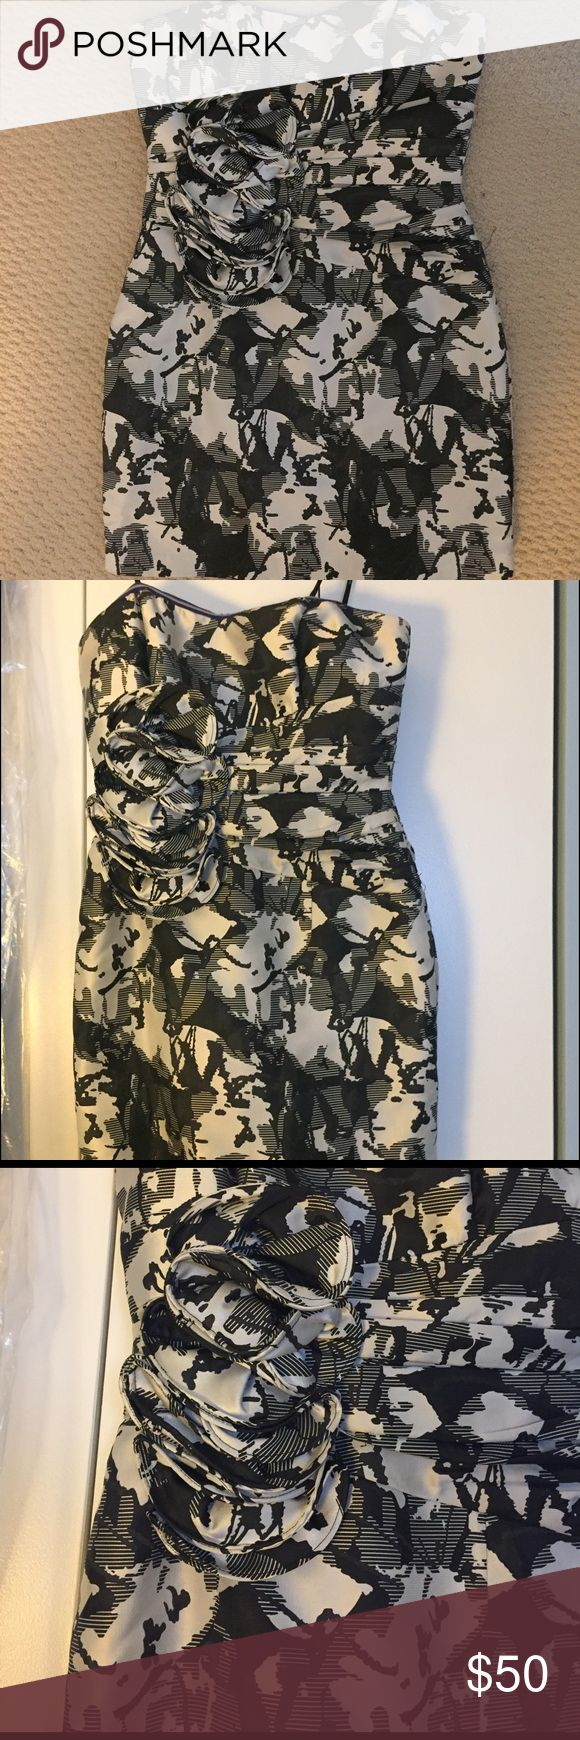 Black and White abstract mini dress 100% Polyester Black and White Abstract Mini Dress with floral design. Ark & Co Dresses Mini